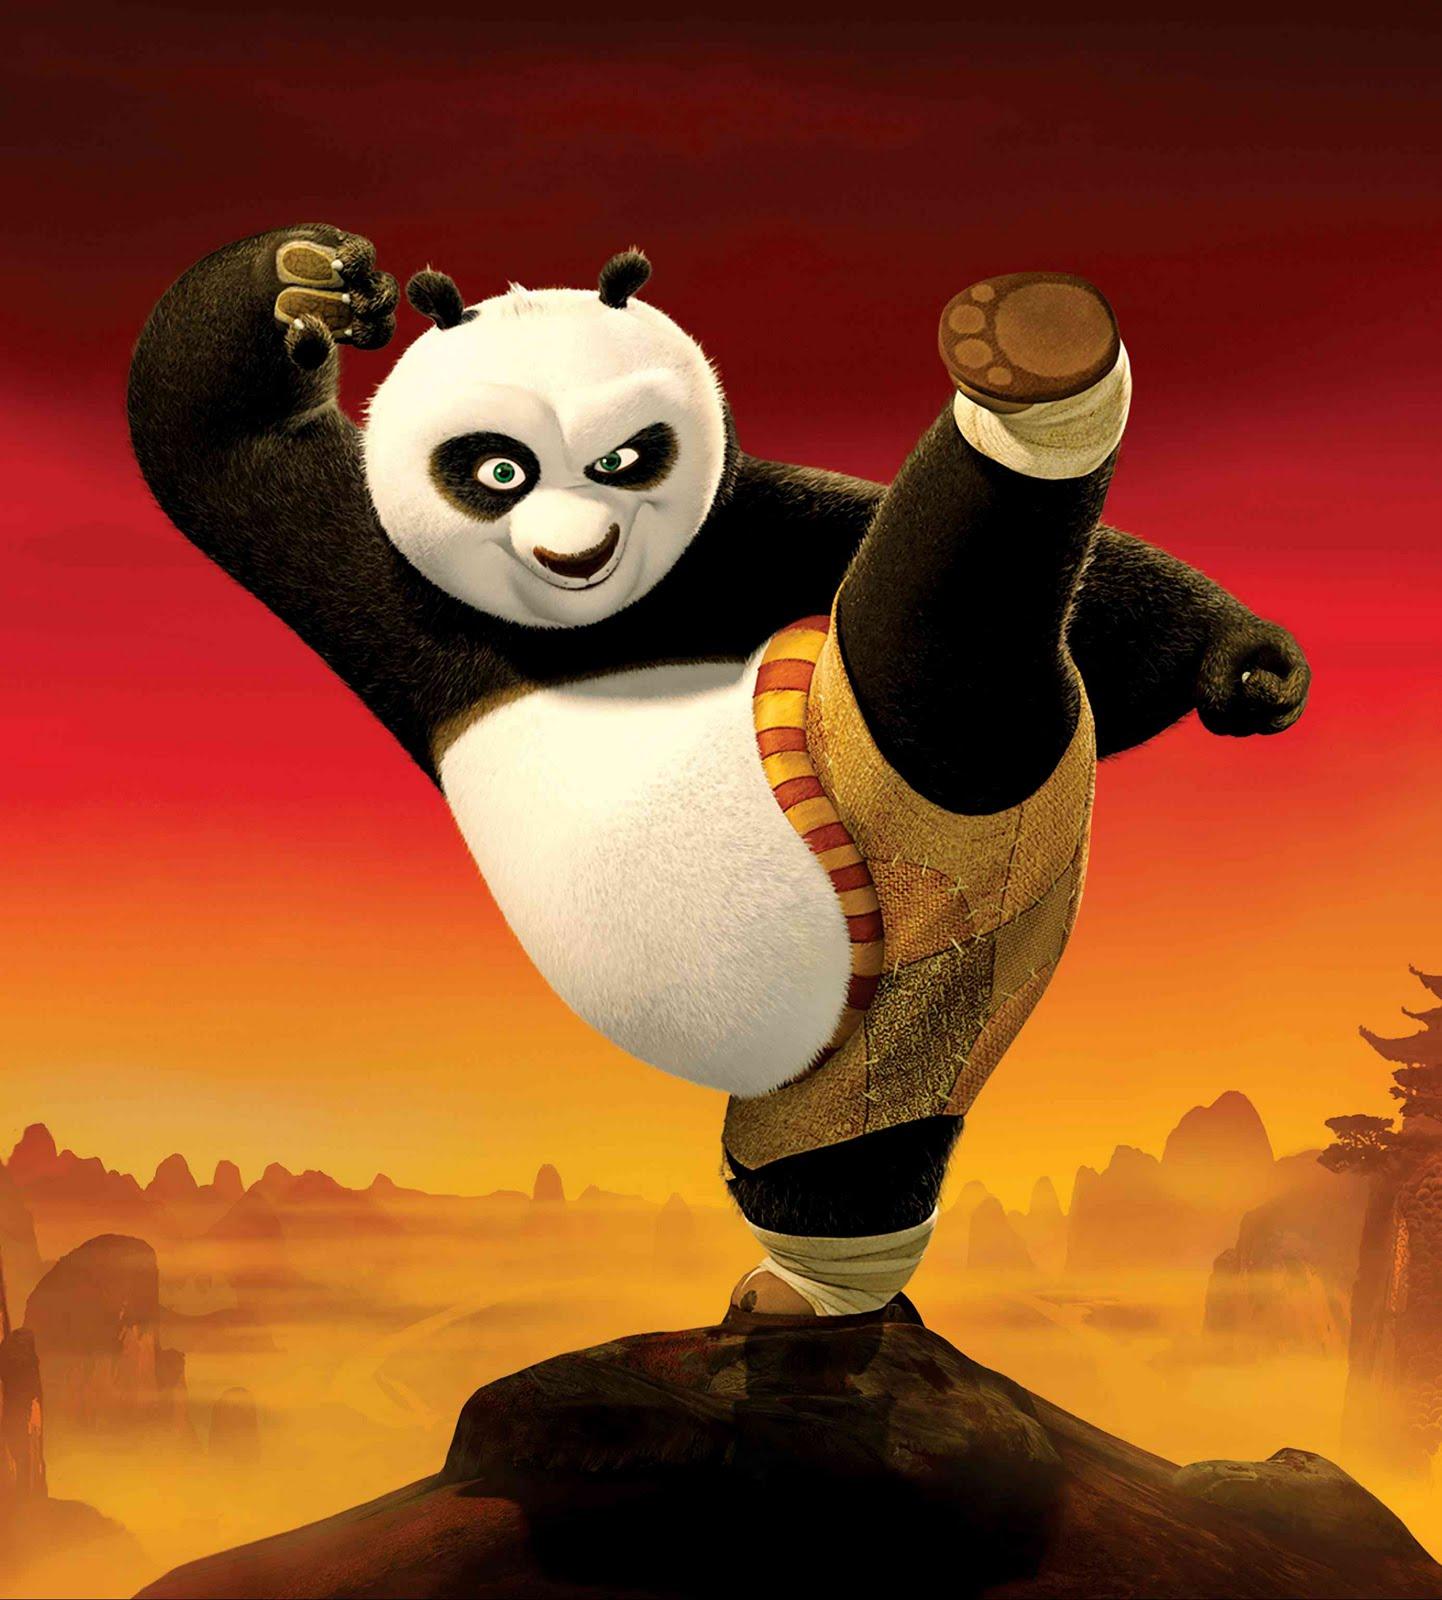 Kung fu panda 2 3d hd poster wallpapers